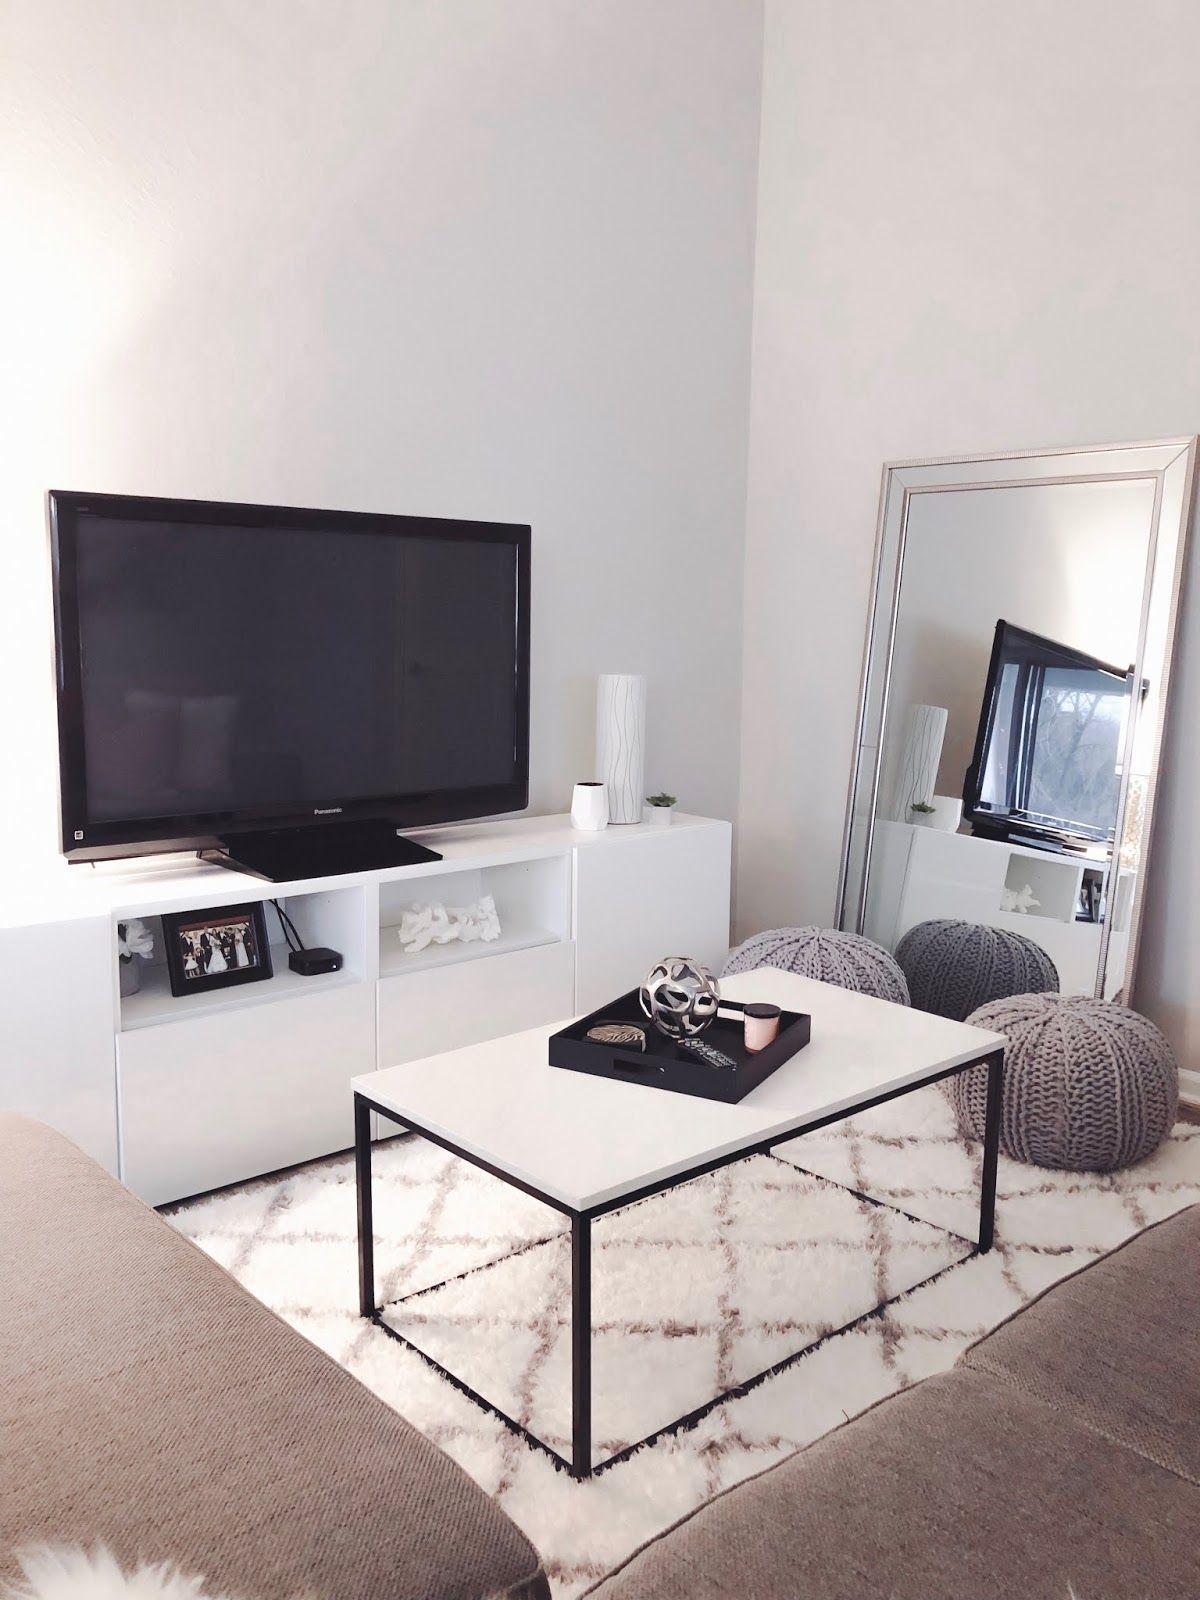 Affordable Apartment Decor Affordable Apartment Decor C